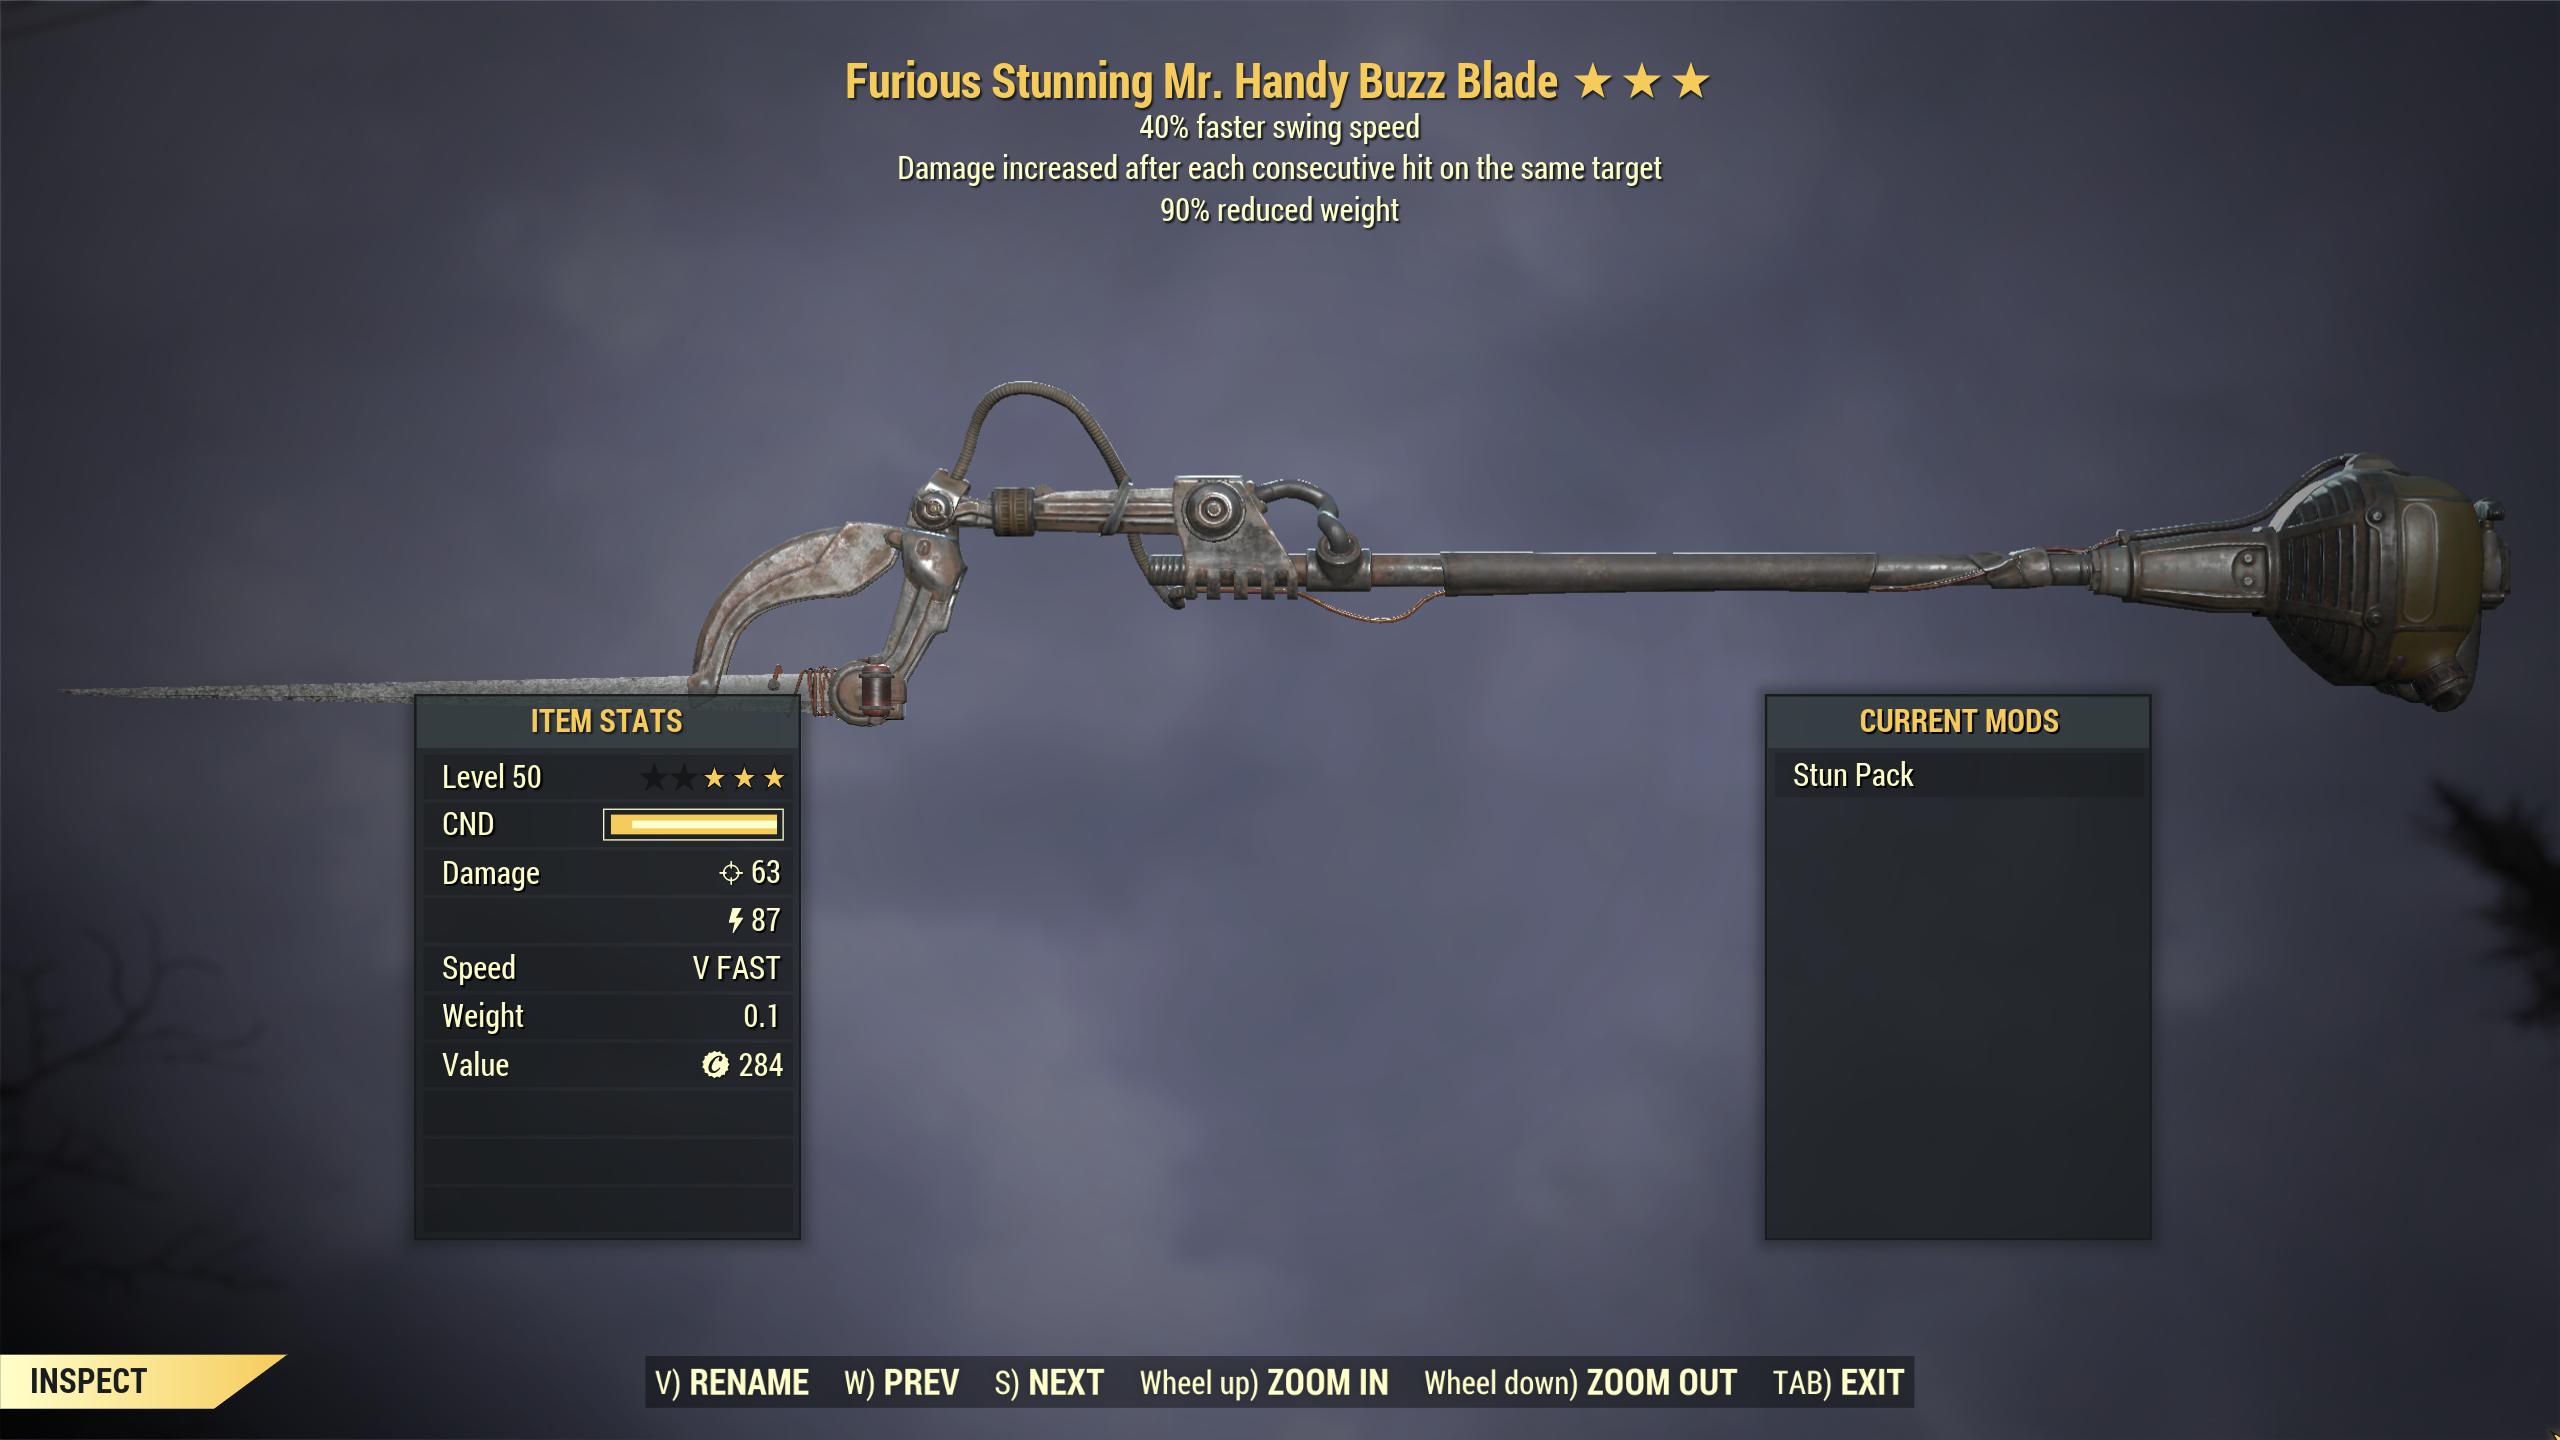 [STUN ENEMIES] ★★★ Furious Mr Handy Buzz Blade[STUN MOD] | FAST DELIVERY |